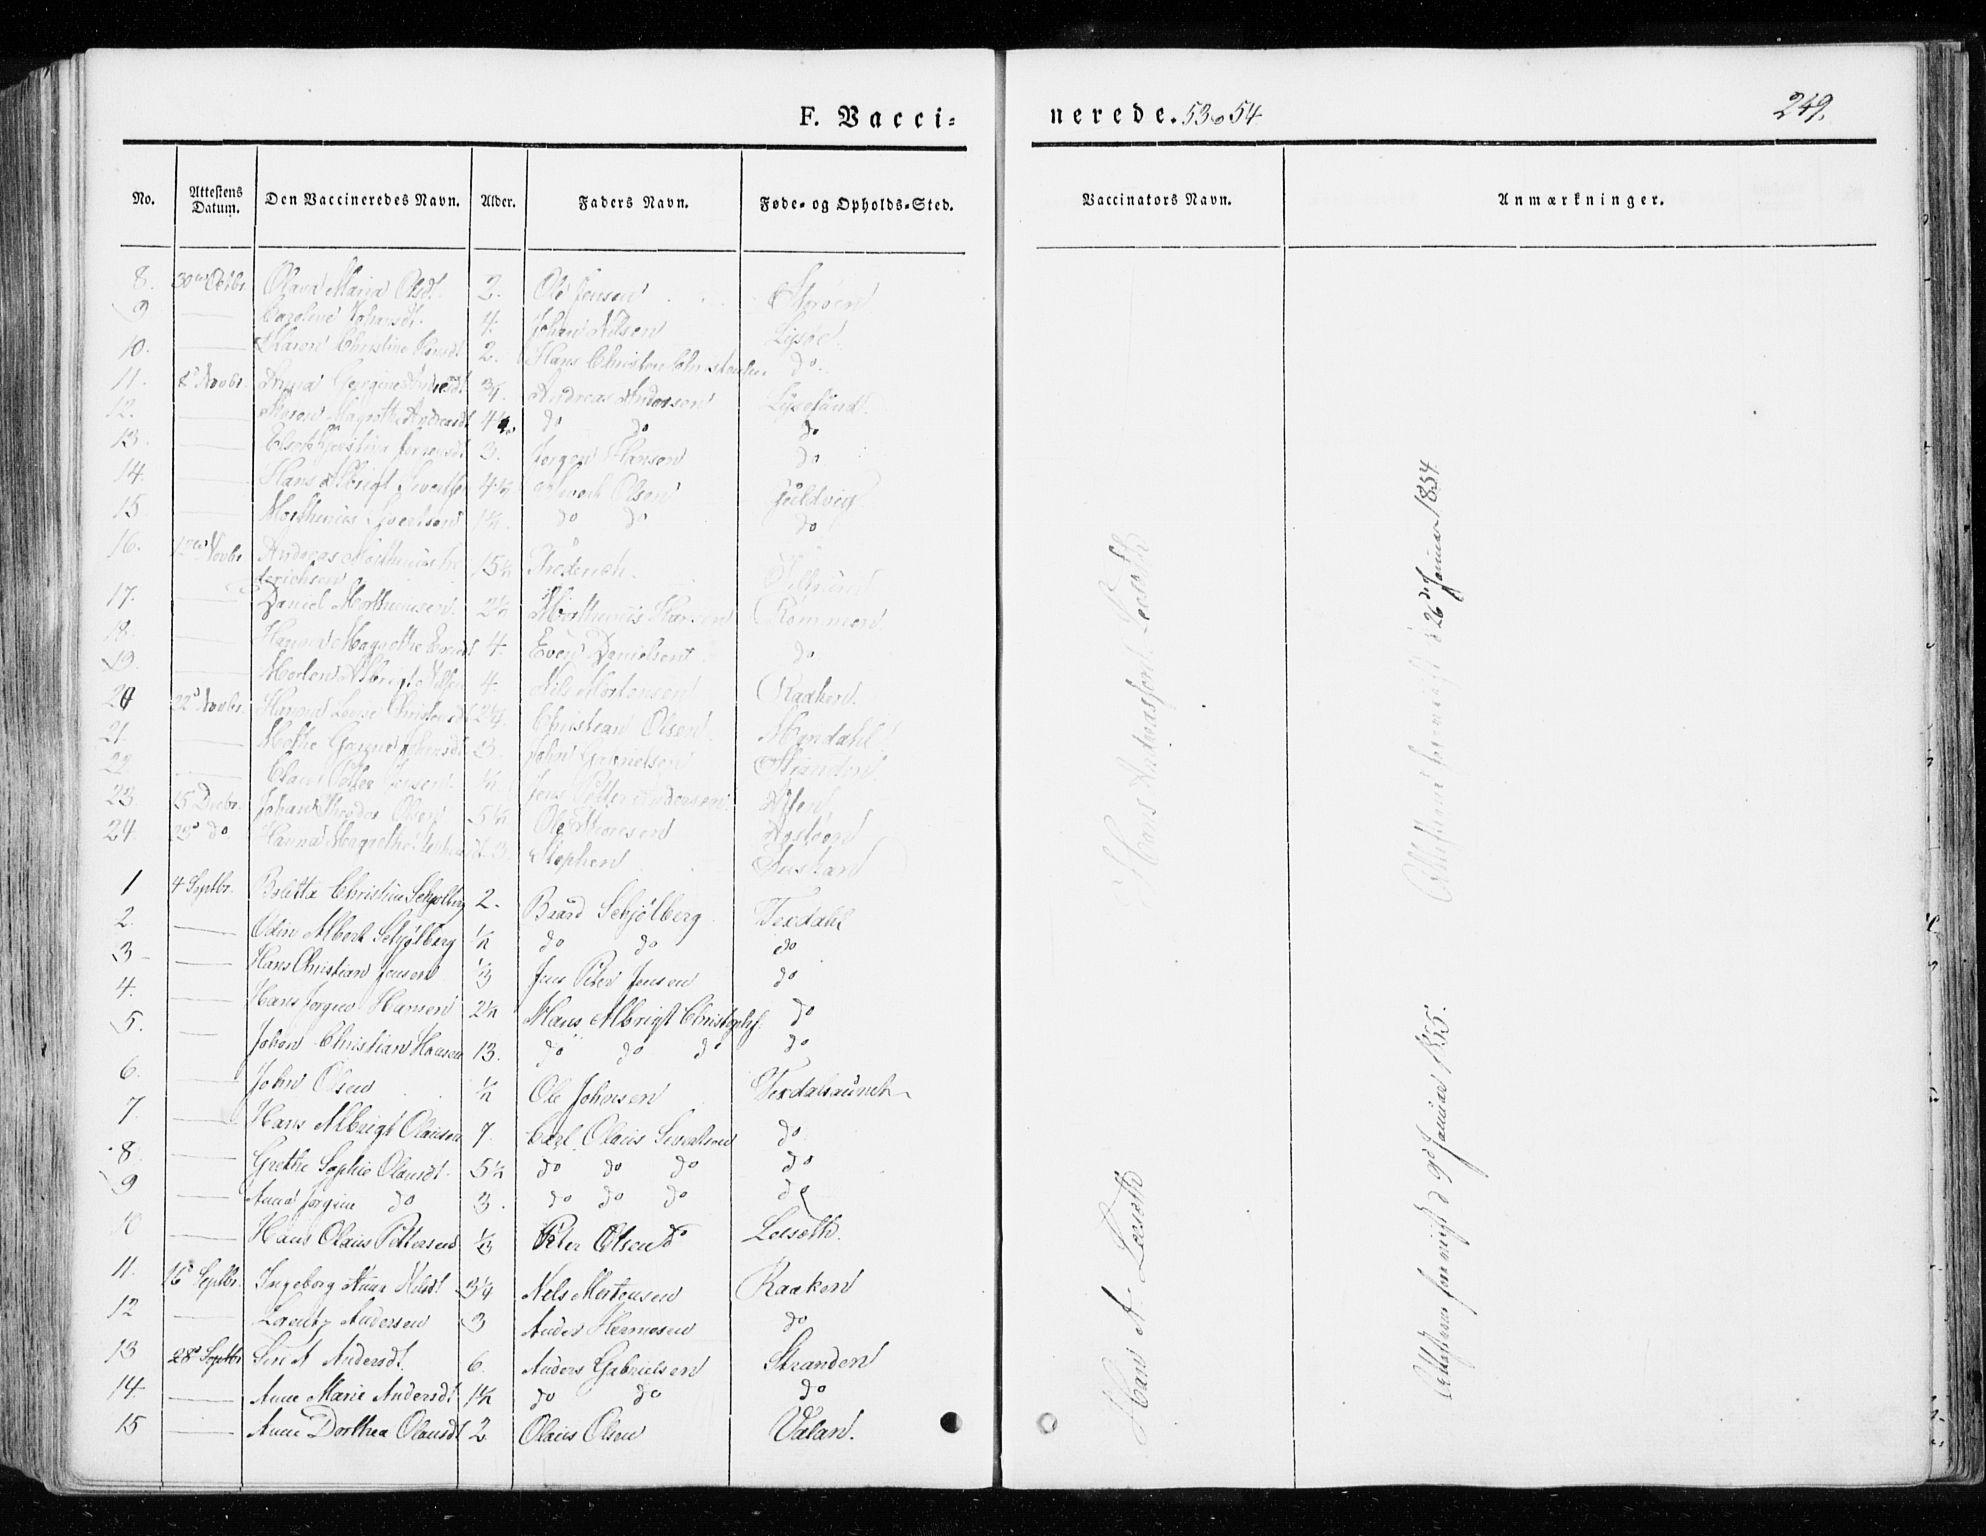 SAT, Ministerialprotokoller, klokkerbøker og fødselsregistre - Sør-Trøndelag, 655/L0677: Parish register (official) no. 655A06, 1847-1860, p. 249